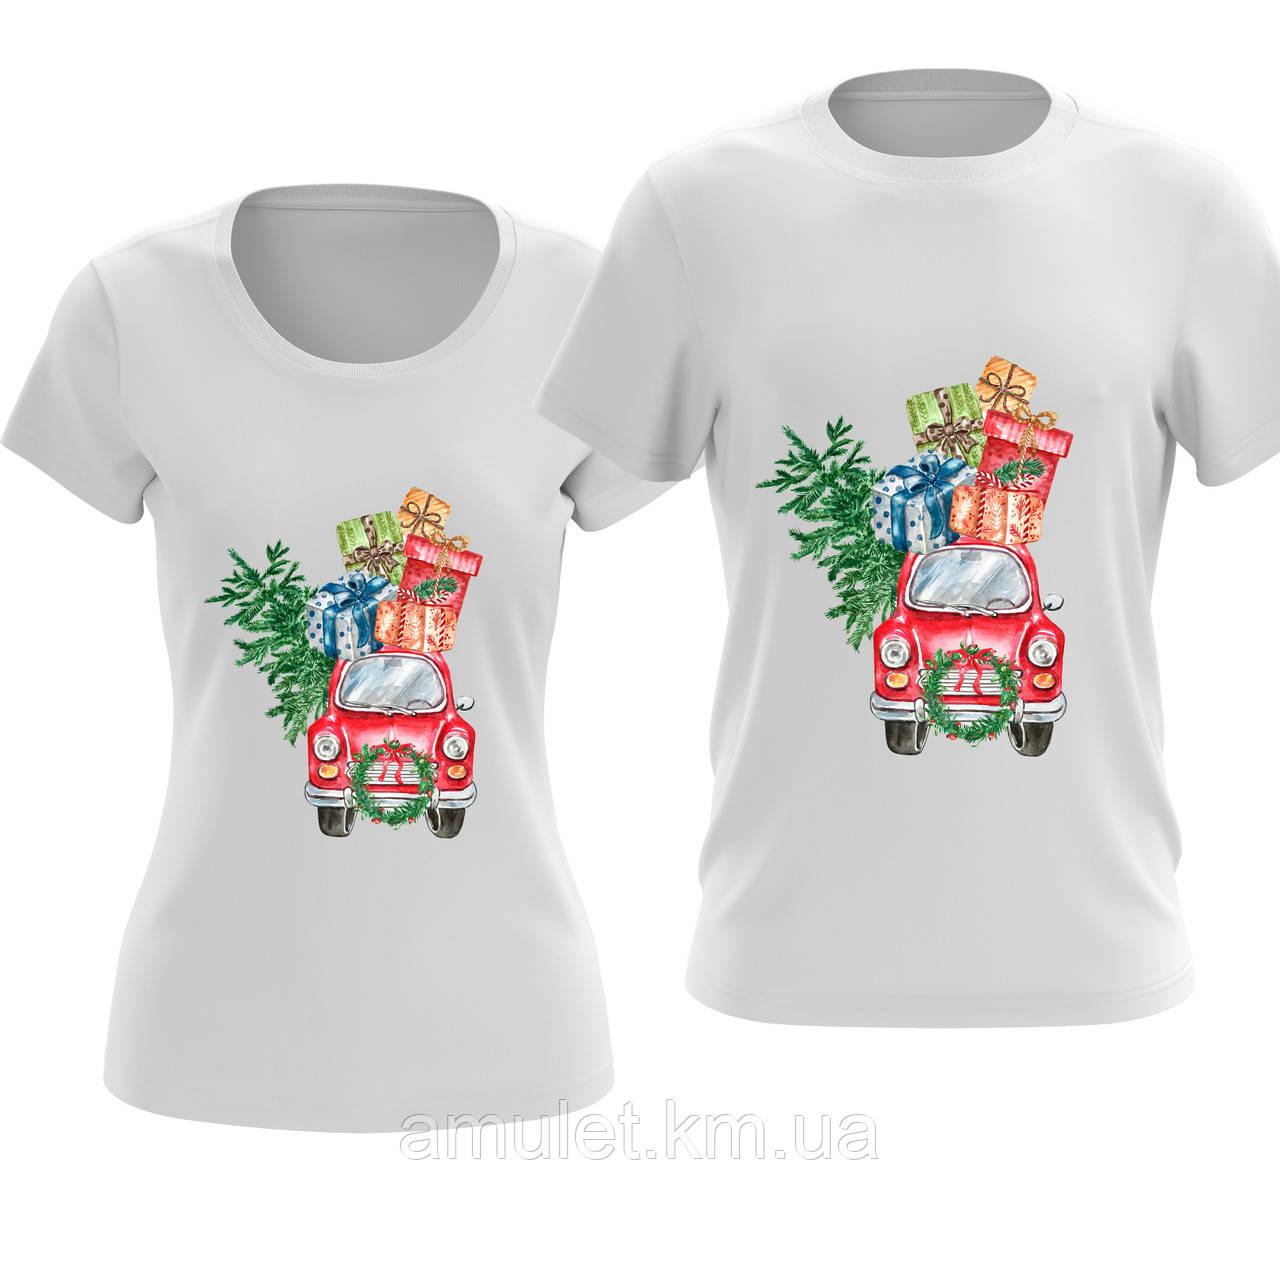 Парные футболки MERRY CHRISTMAS